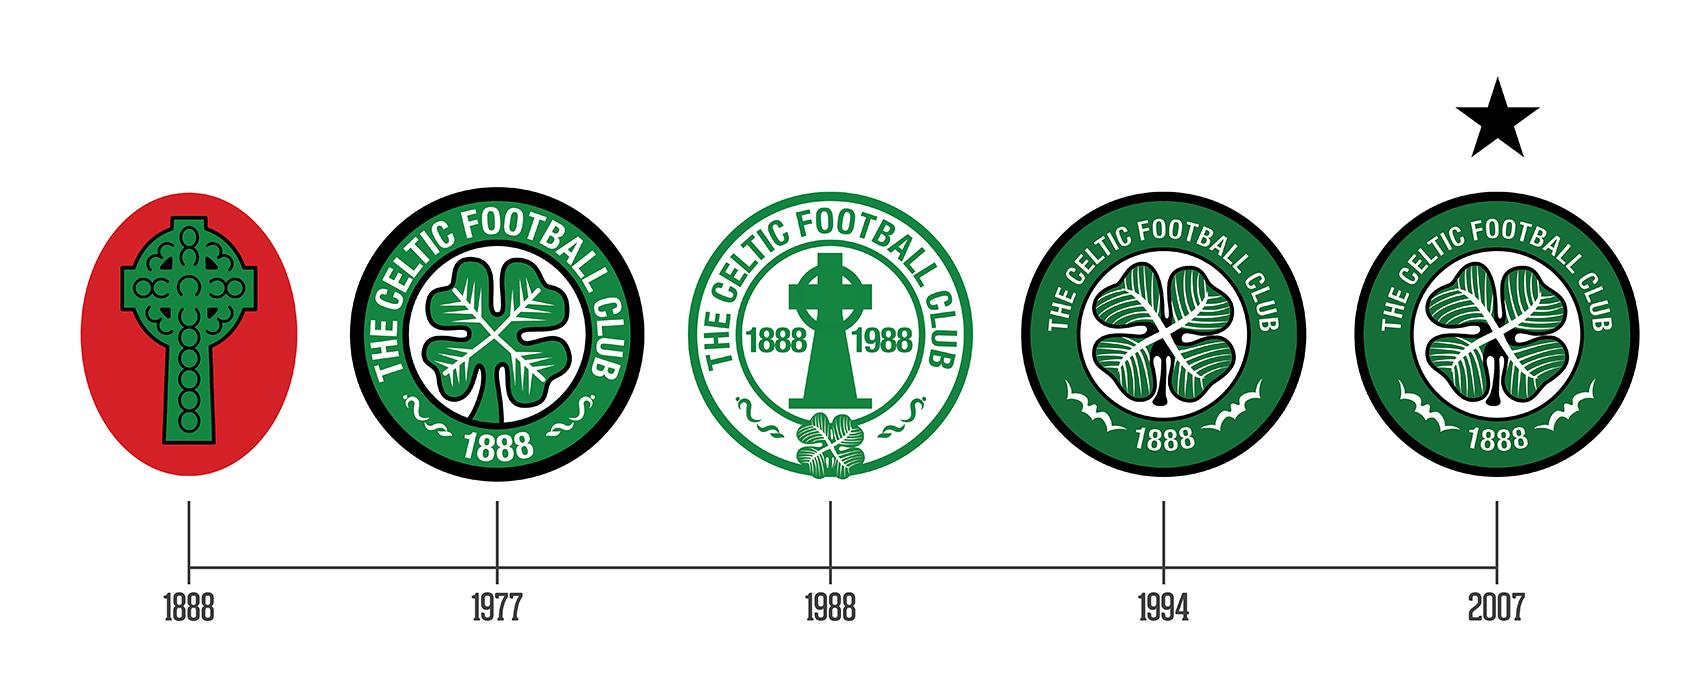 Steelers Wallpaper Hd Rebrand Celtic Fc Elijah Wade Artefacts